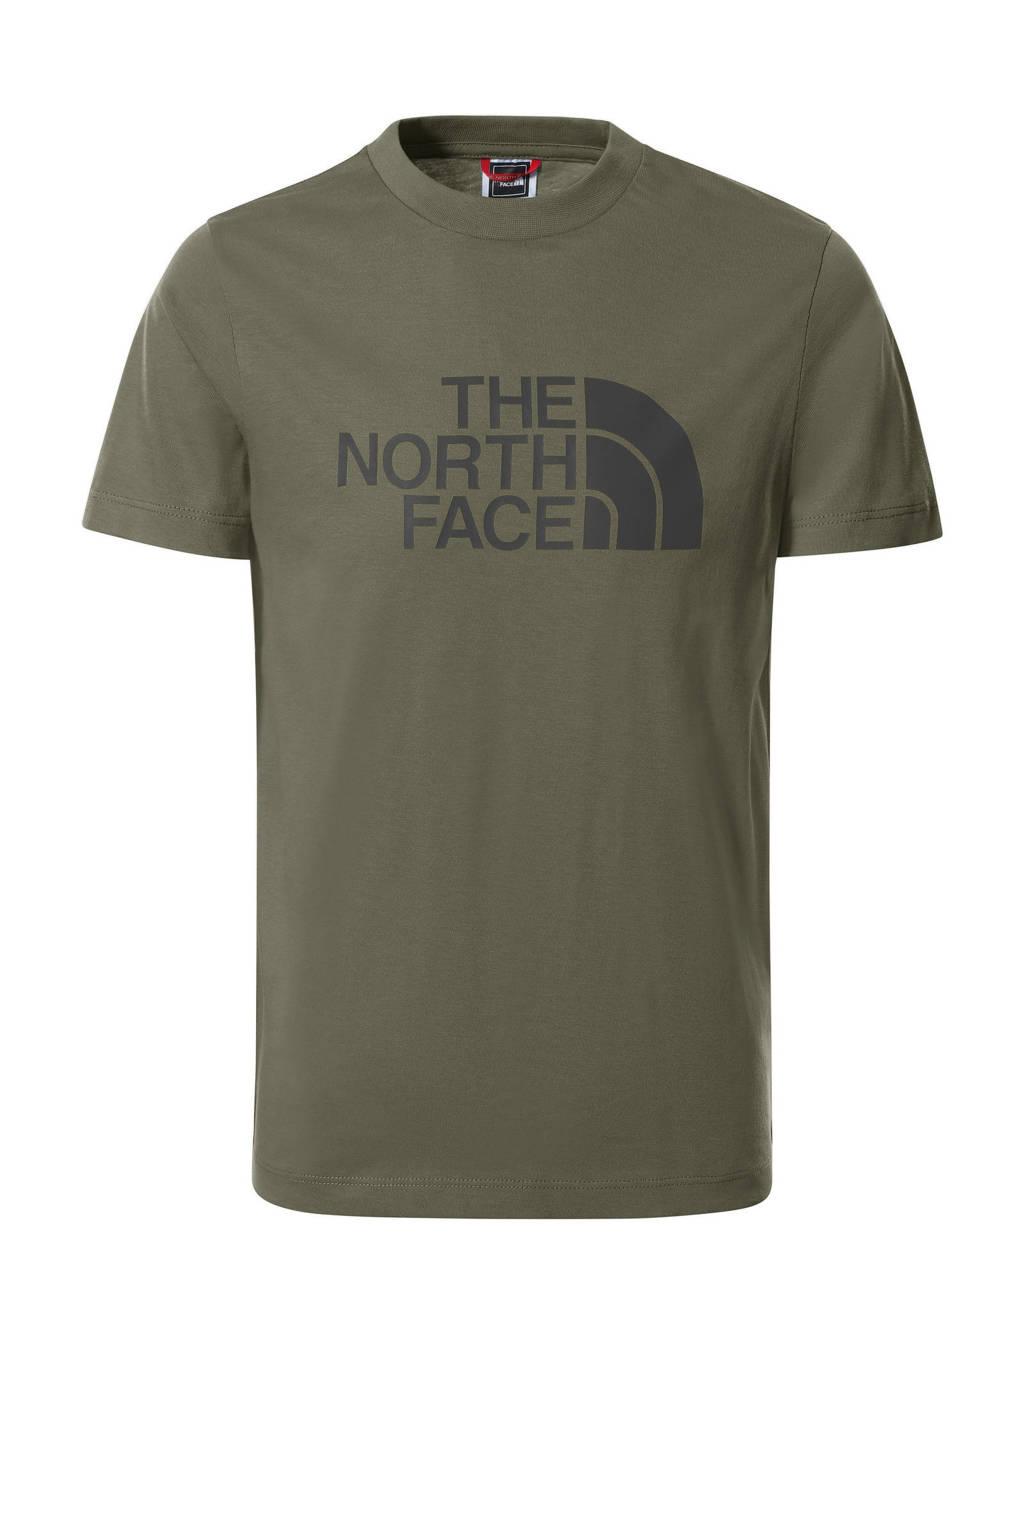 The North Face unisex T-shirt Easy groen, Groen